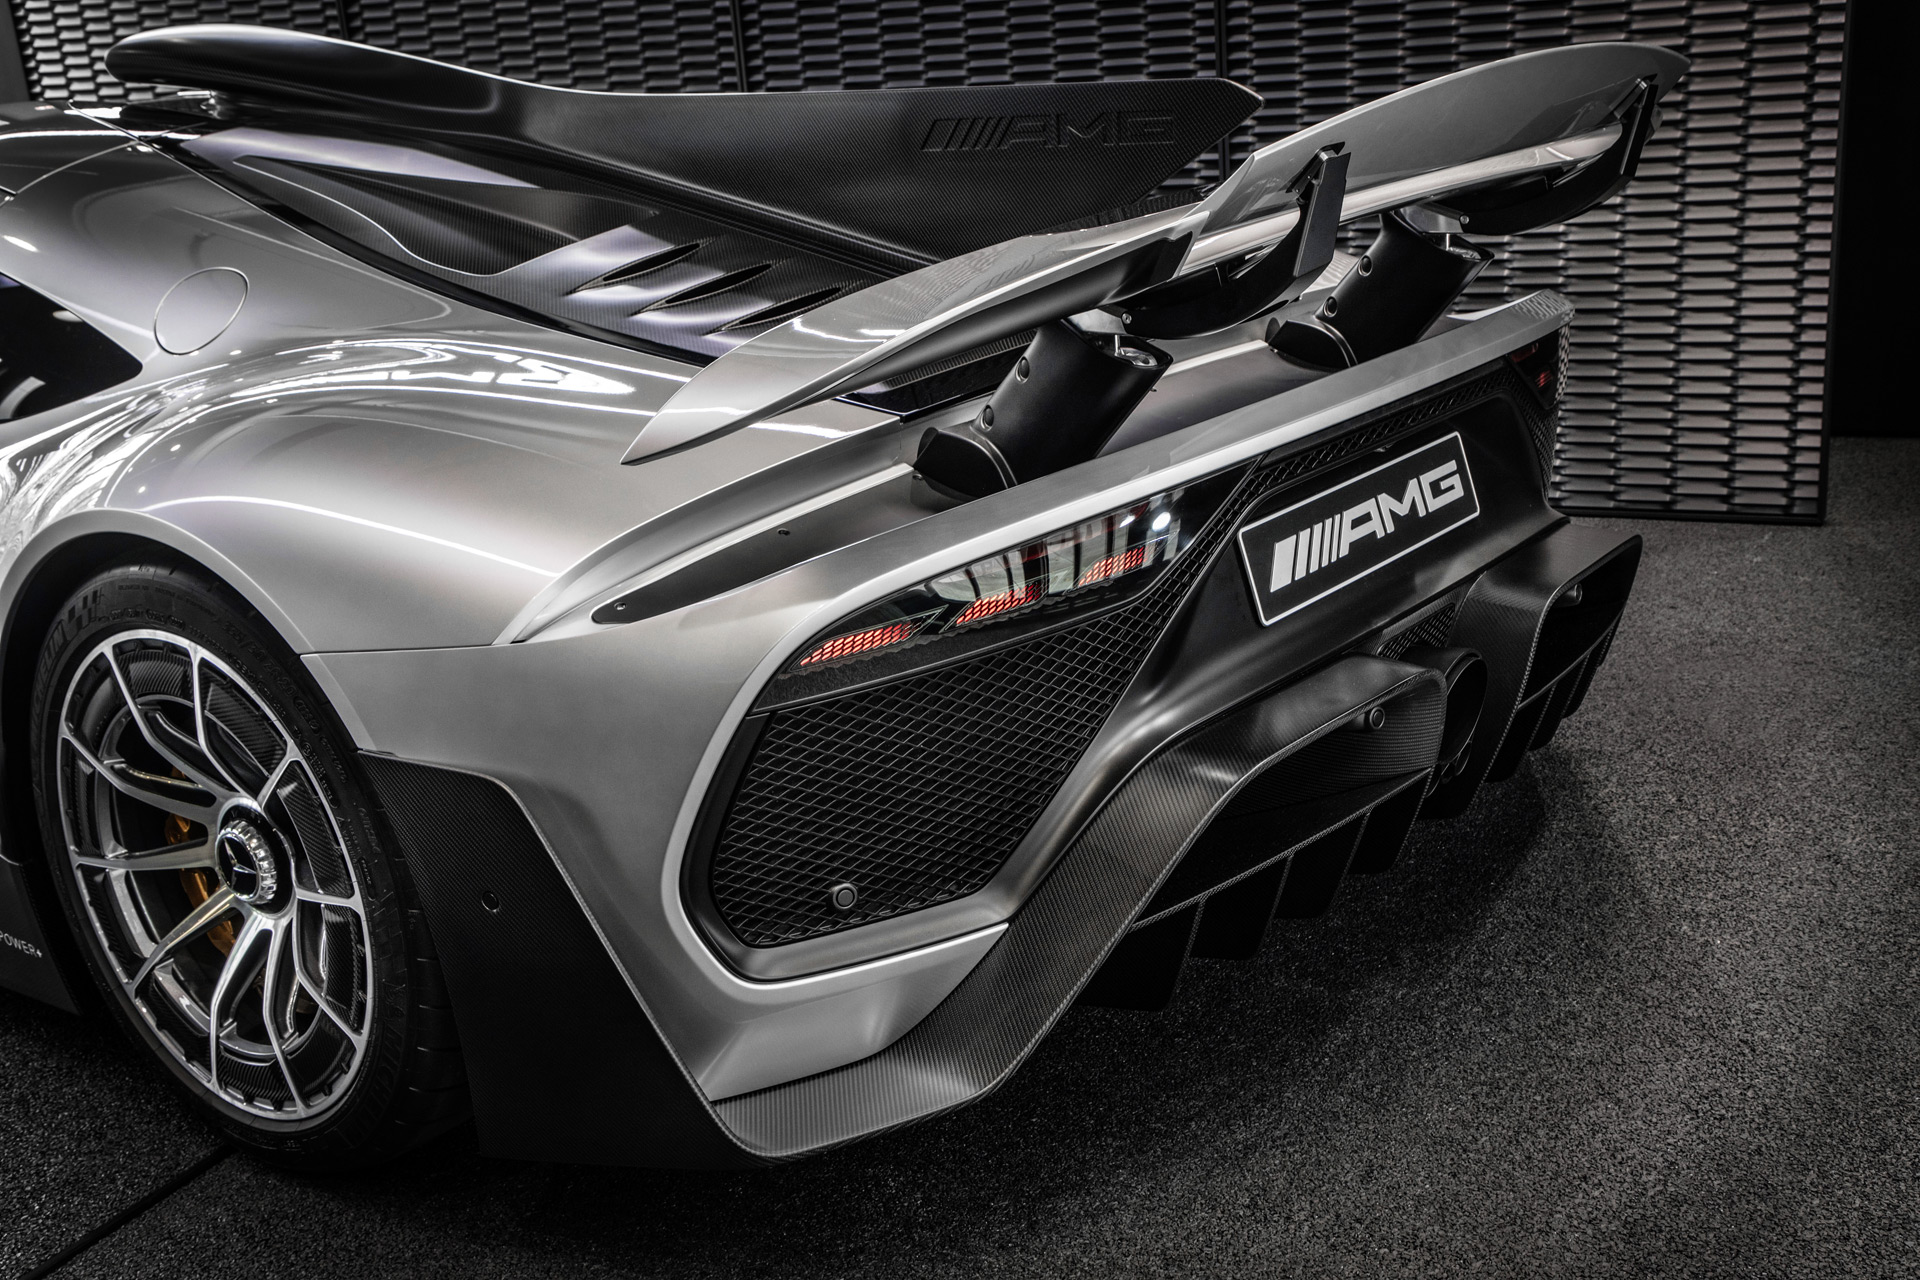 2020 Jaguar XE, 2020 Aston Martin Vantage AMR, Mercedes-AMG One: Car News Headlines